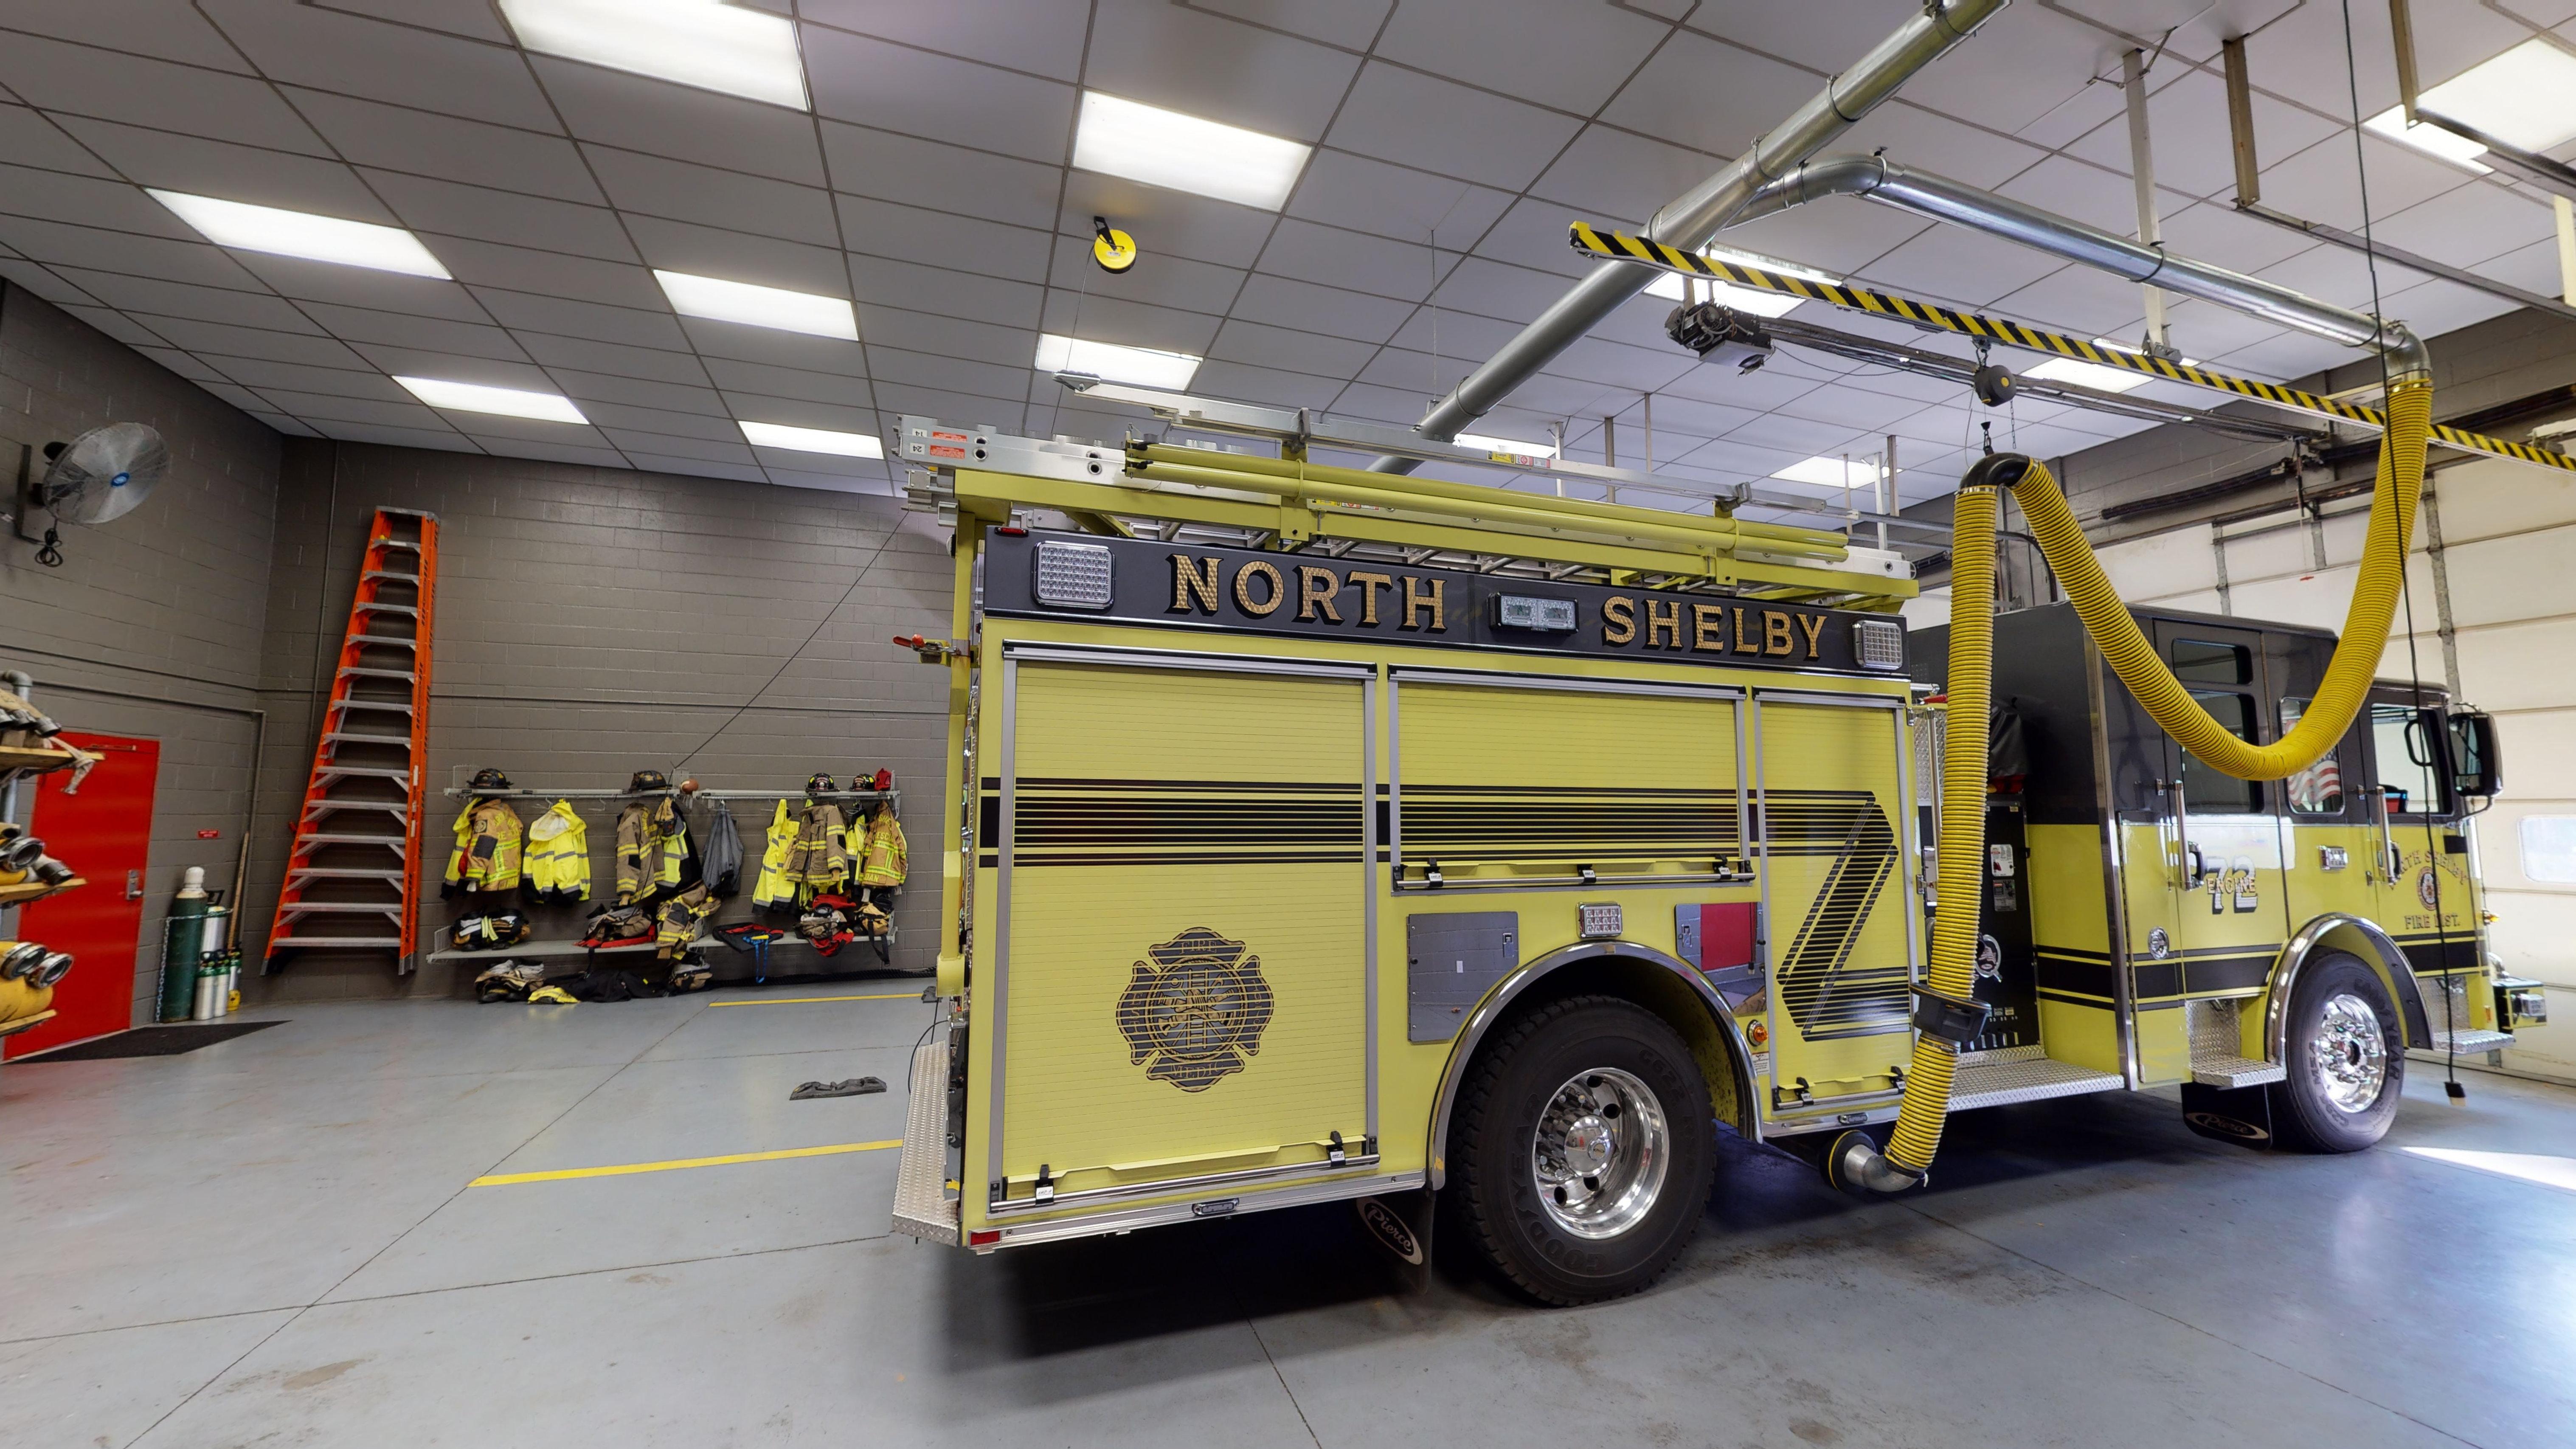 North-Shelby-Fire-District-Saber-custom-pumper-06182021_100117